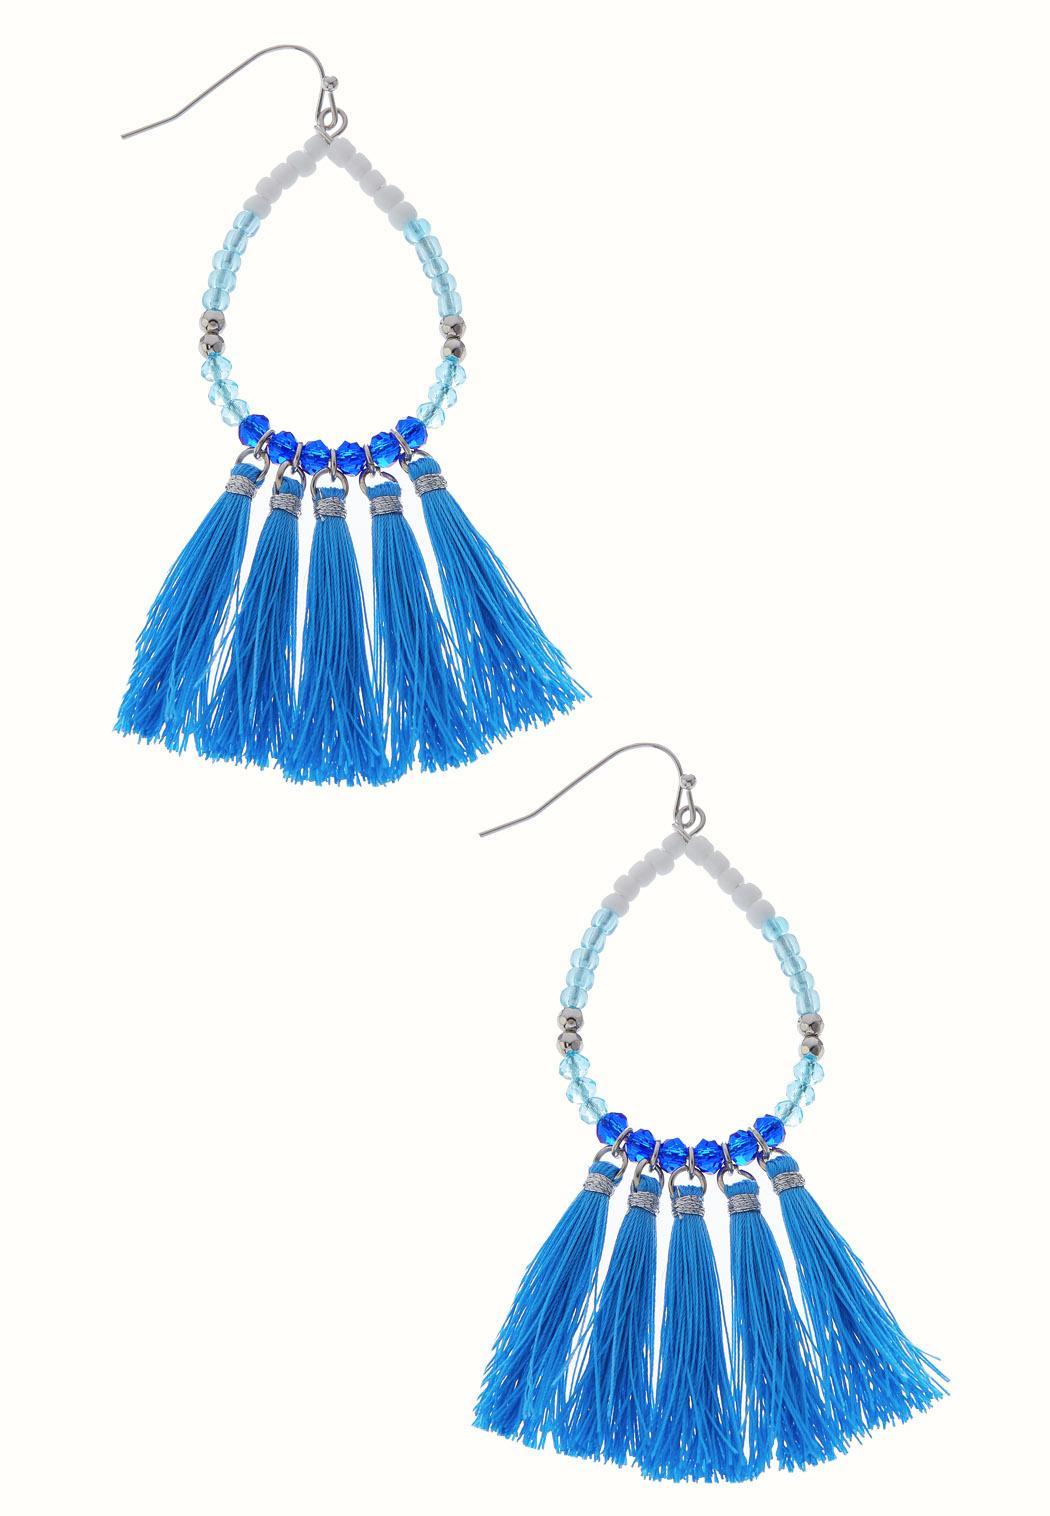 Tear Hoop Tassel Earrings